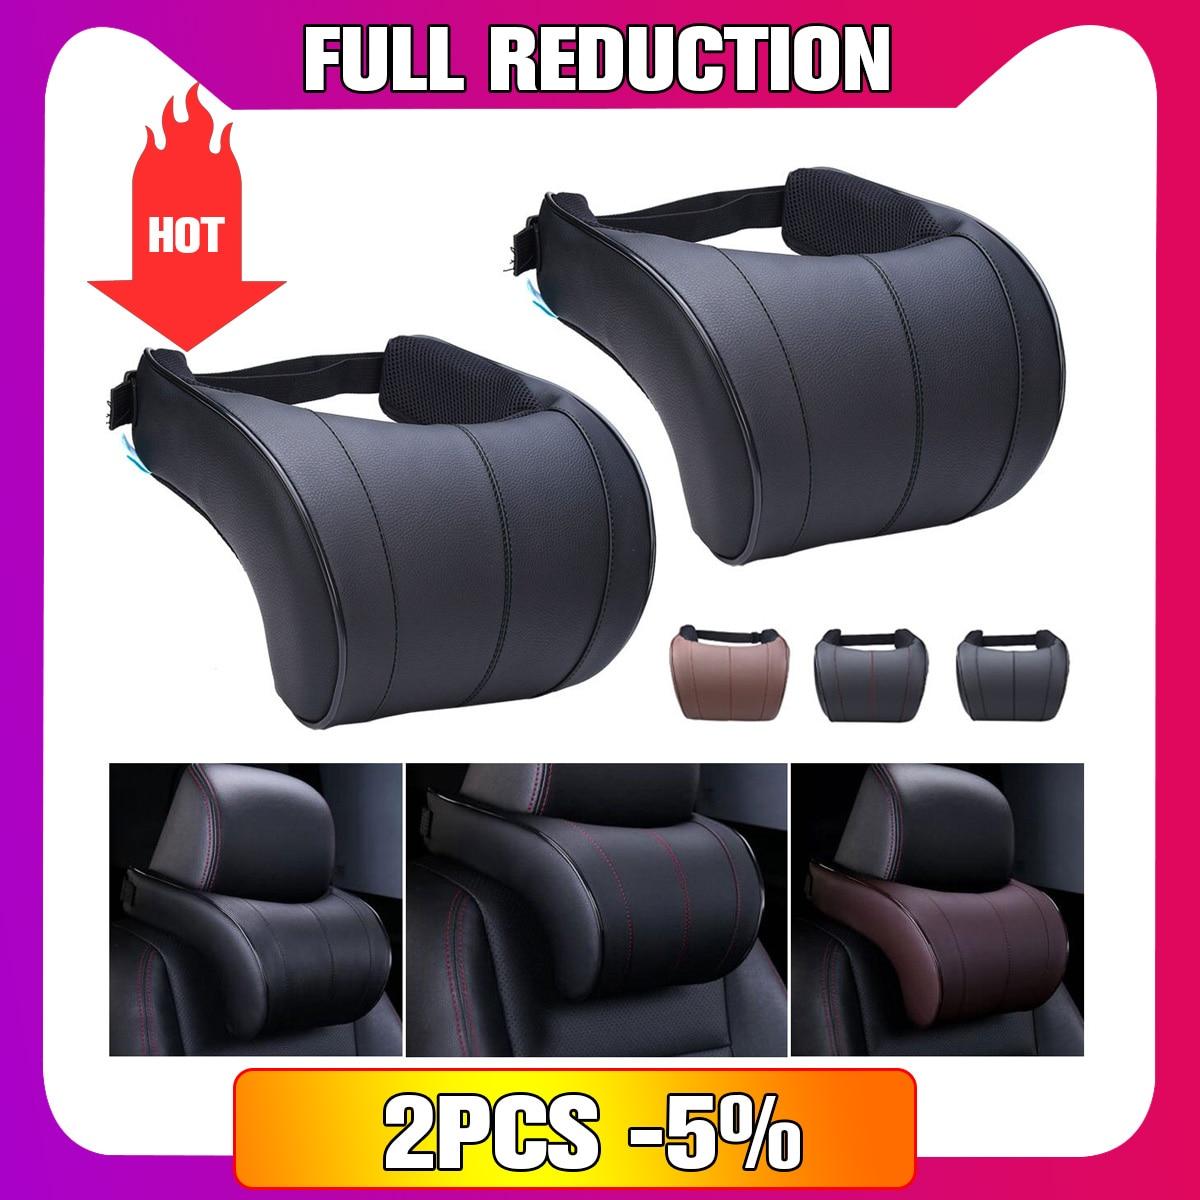 1PCS PU Leather Auto Car Neck Pillow Memory Foam Pillows Neck Rest Seat Headrest Cushion Pad 3 Colors High Quality все цены